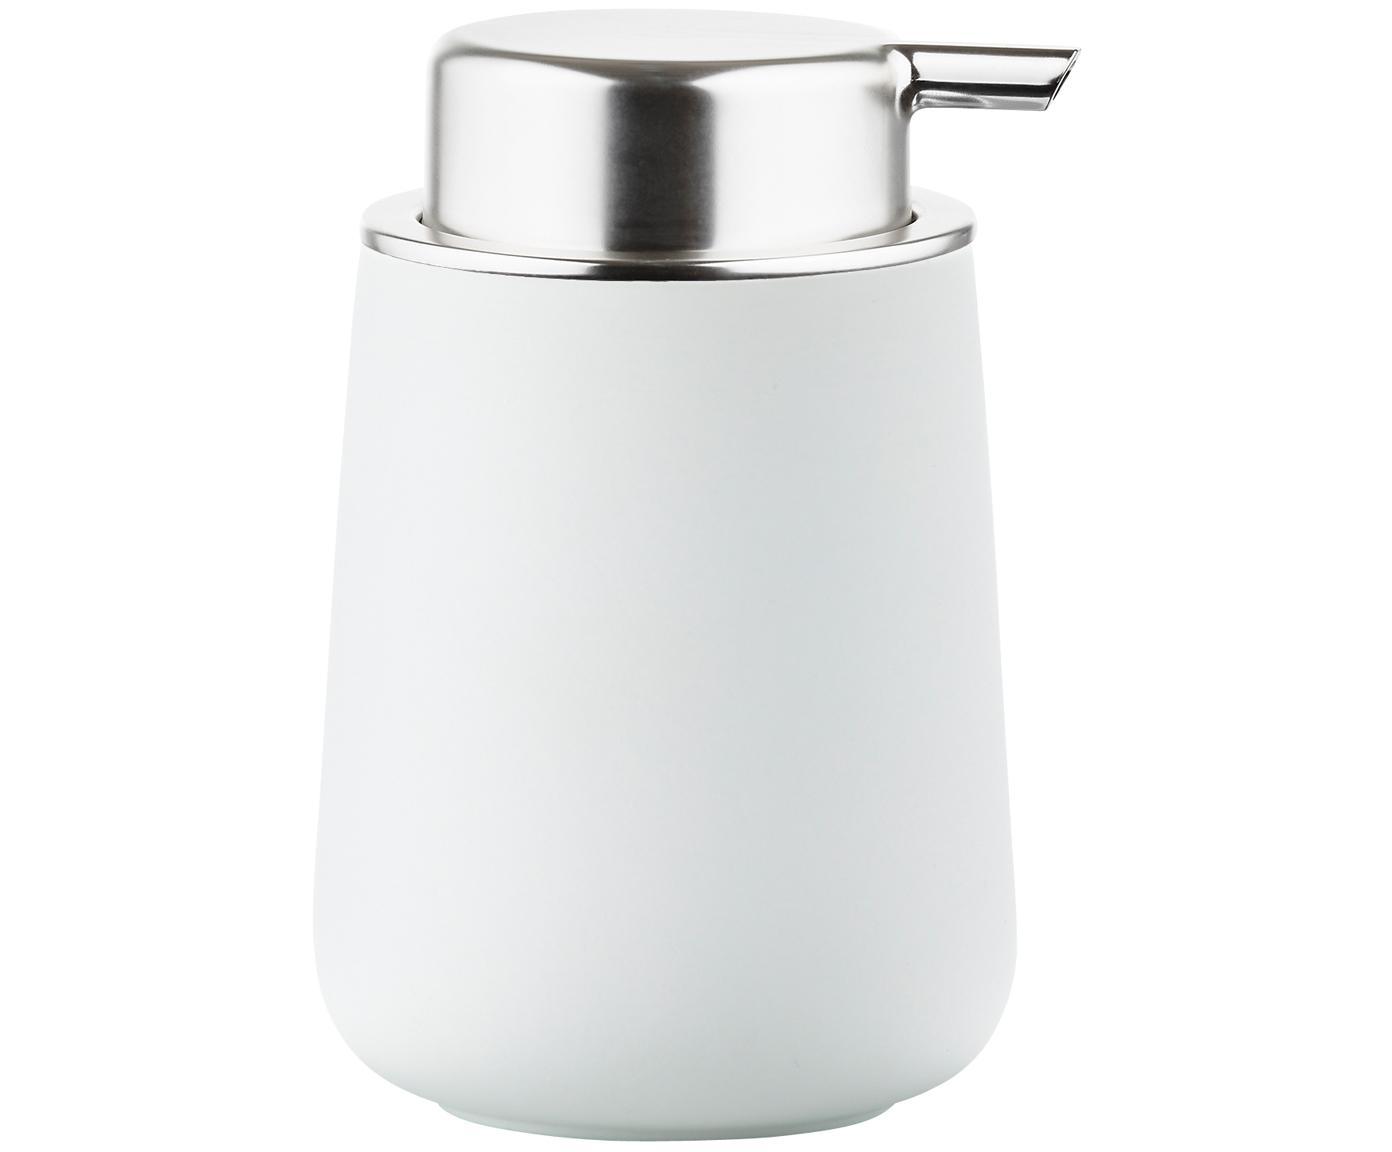 Zeepdispenser Push, Pompje: kunststof, Mat wit, zilverkleurig, Ø 8 x H 12 cm